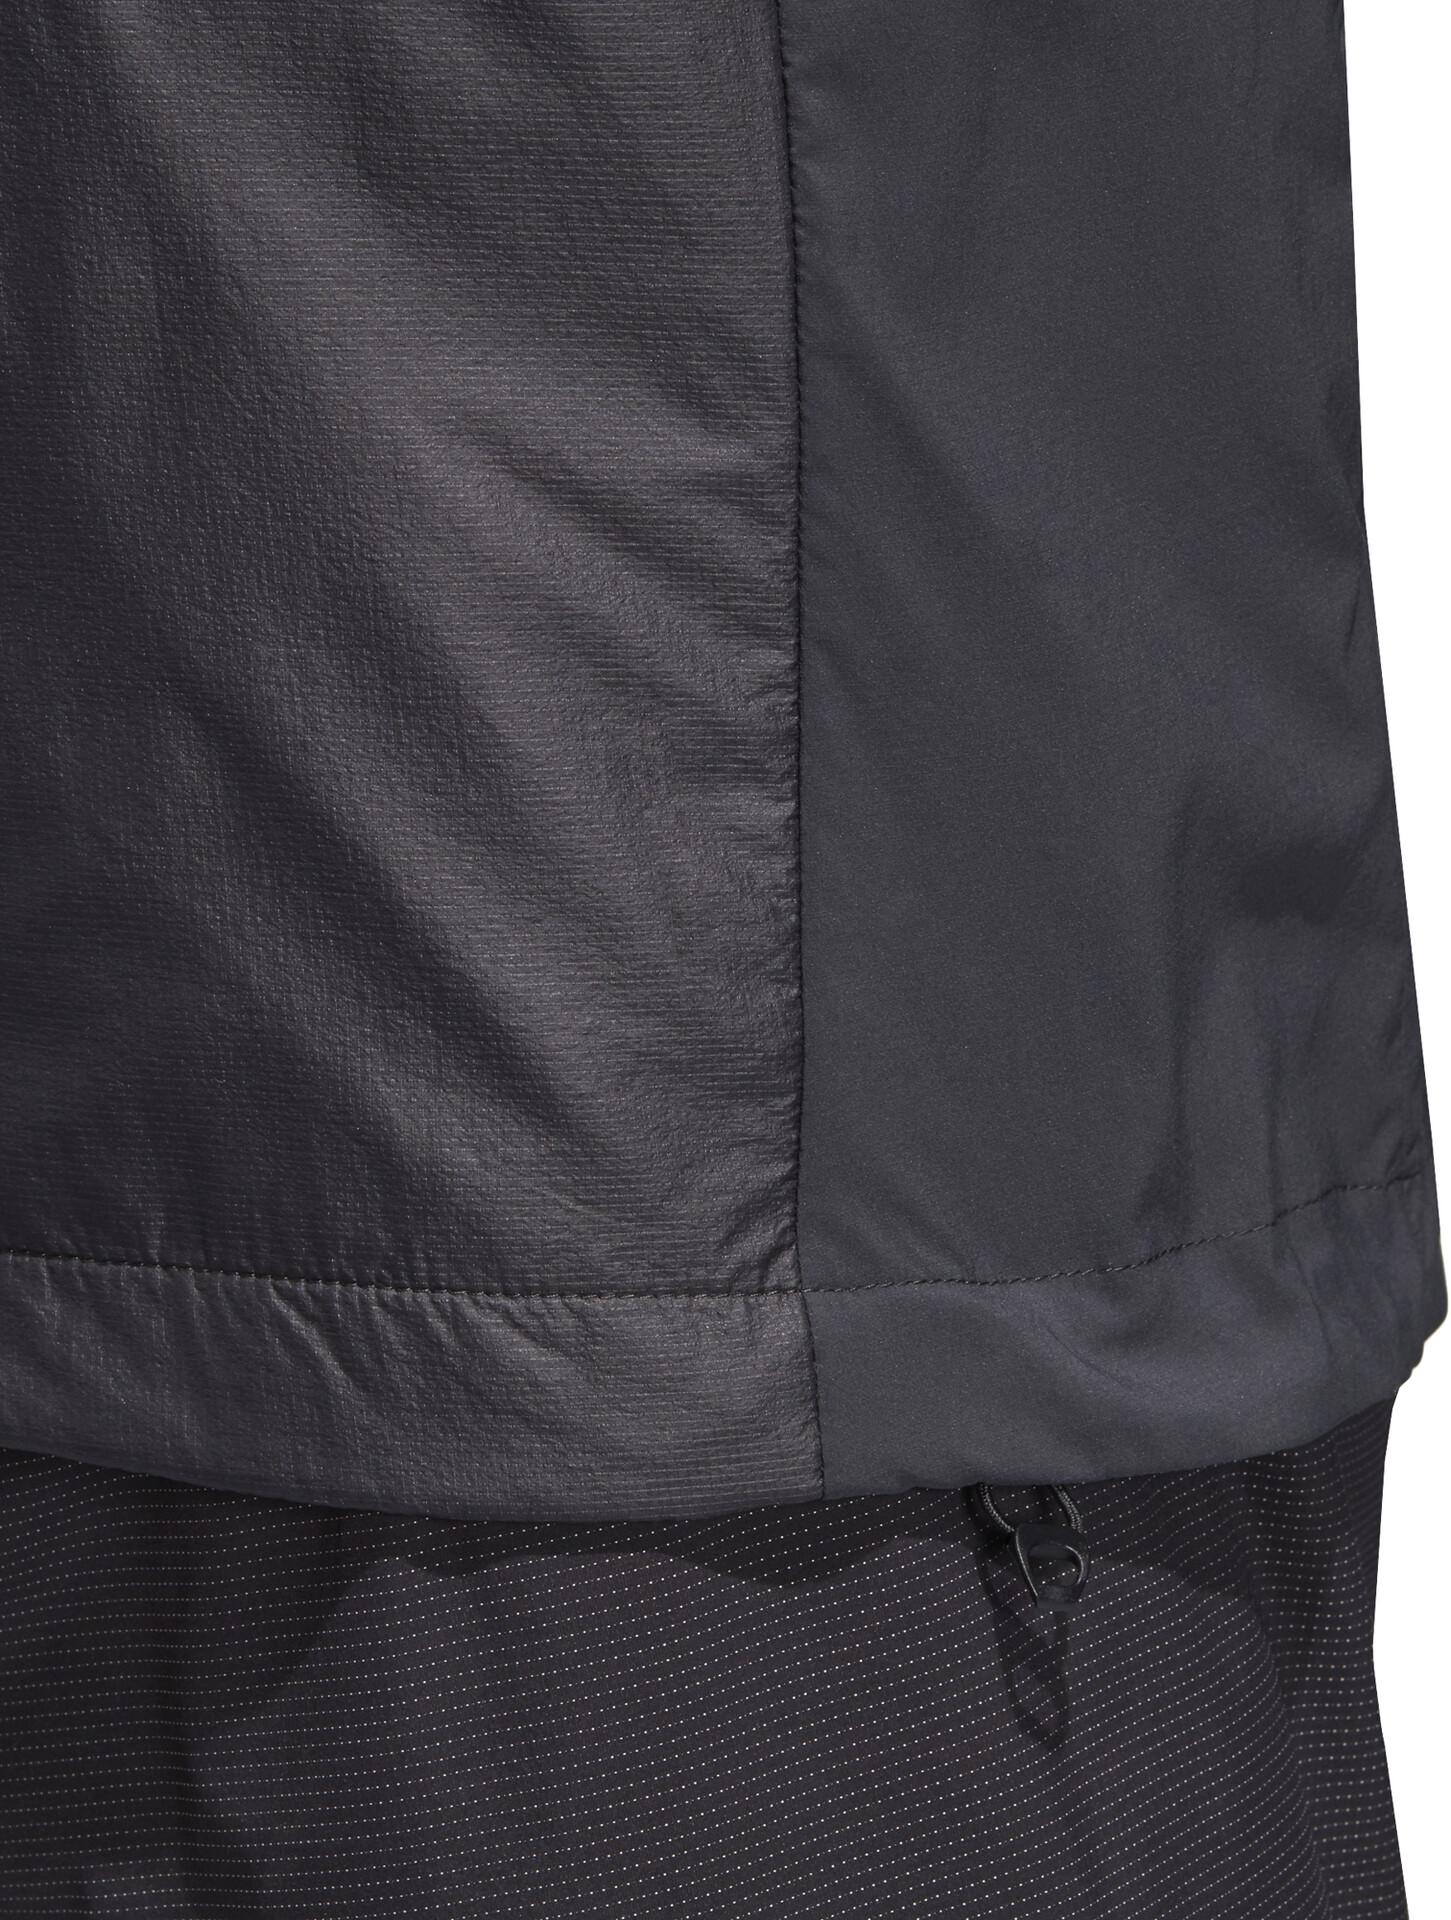 Agravic Carbon Vest Men Terrex Adidas 5q3Lc4jAR